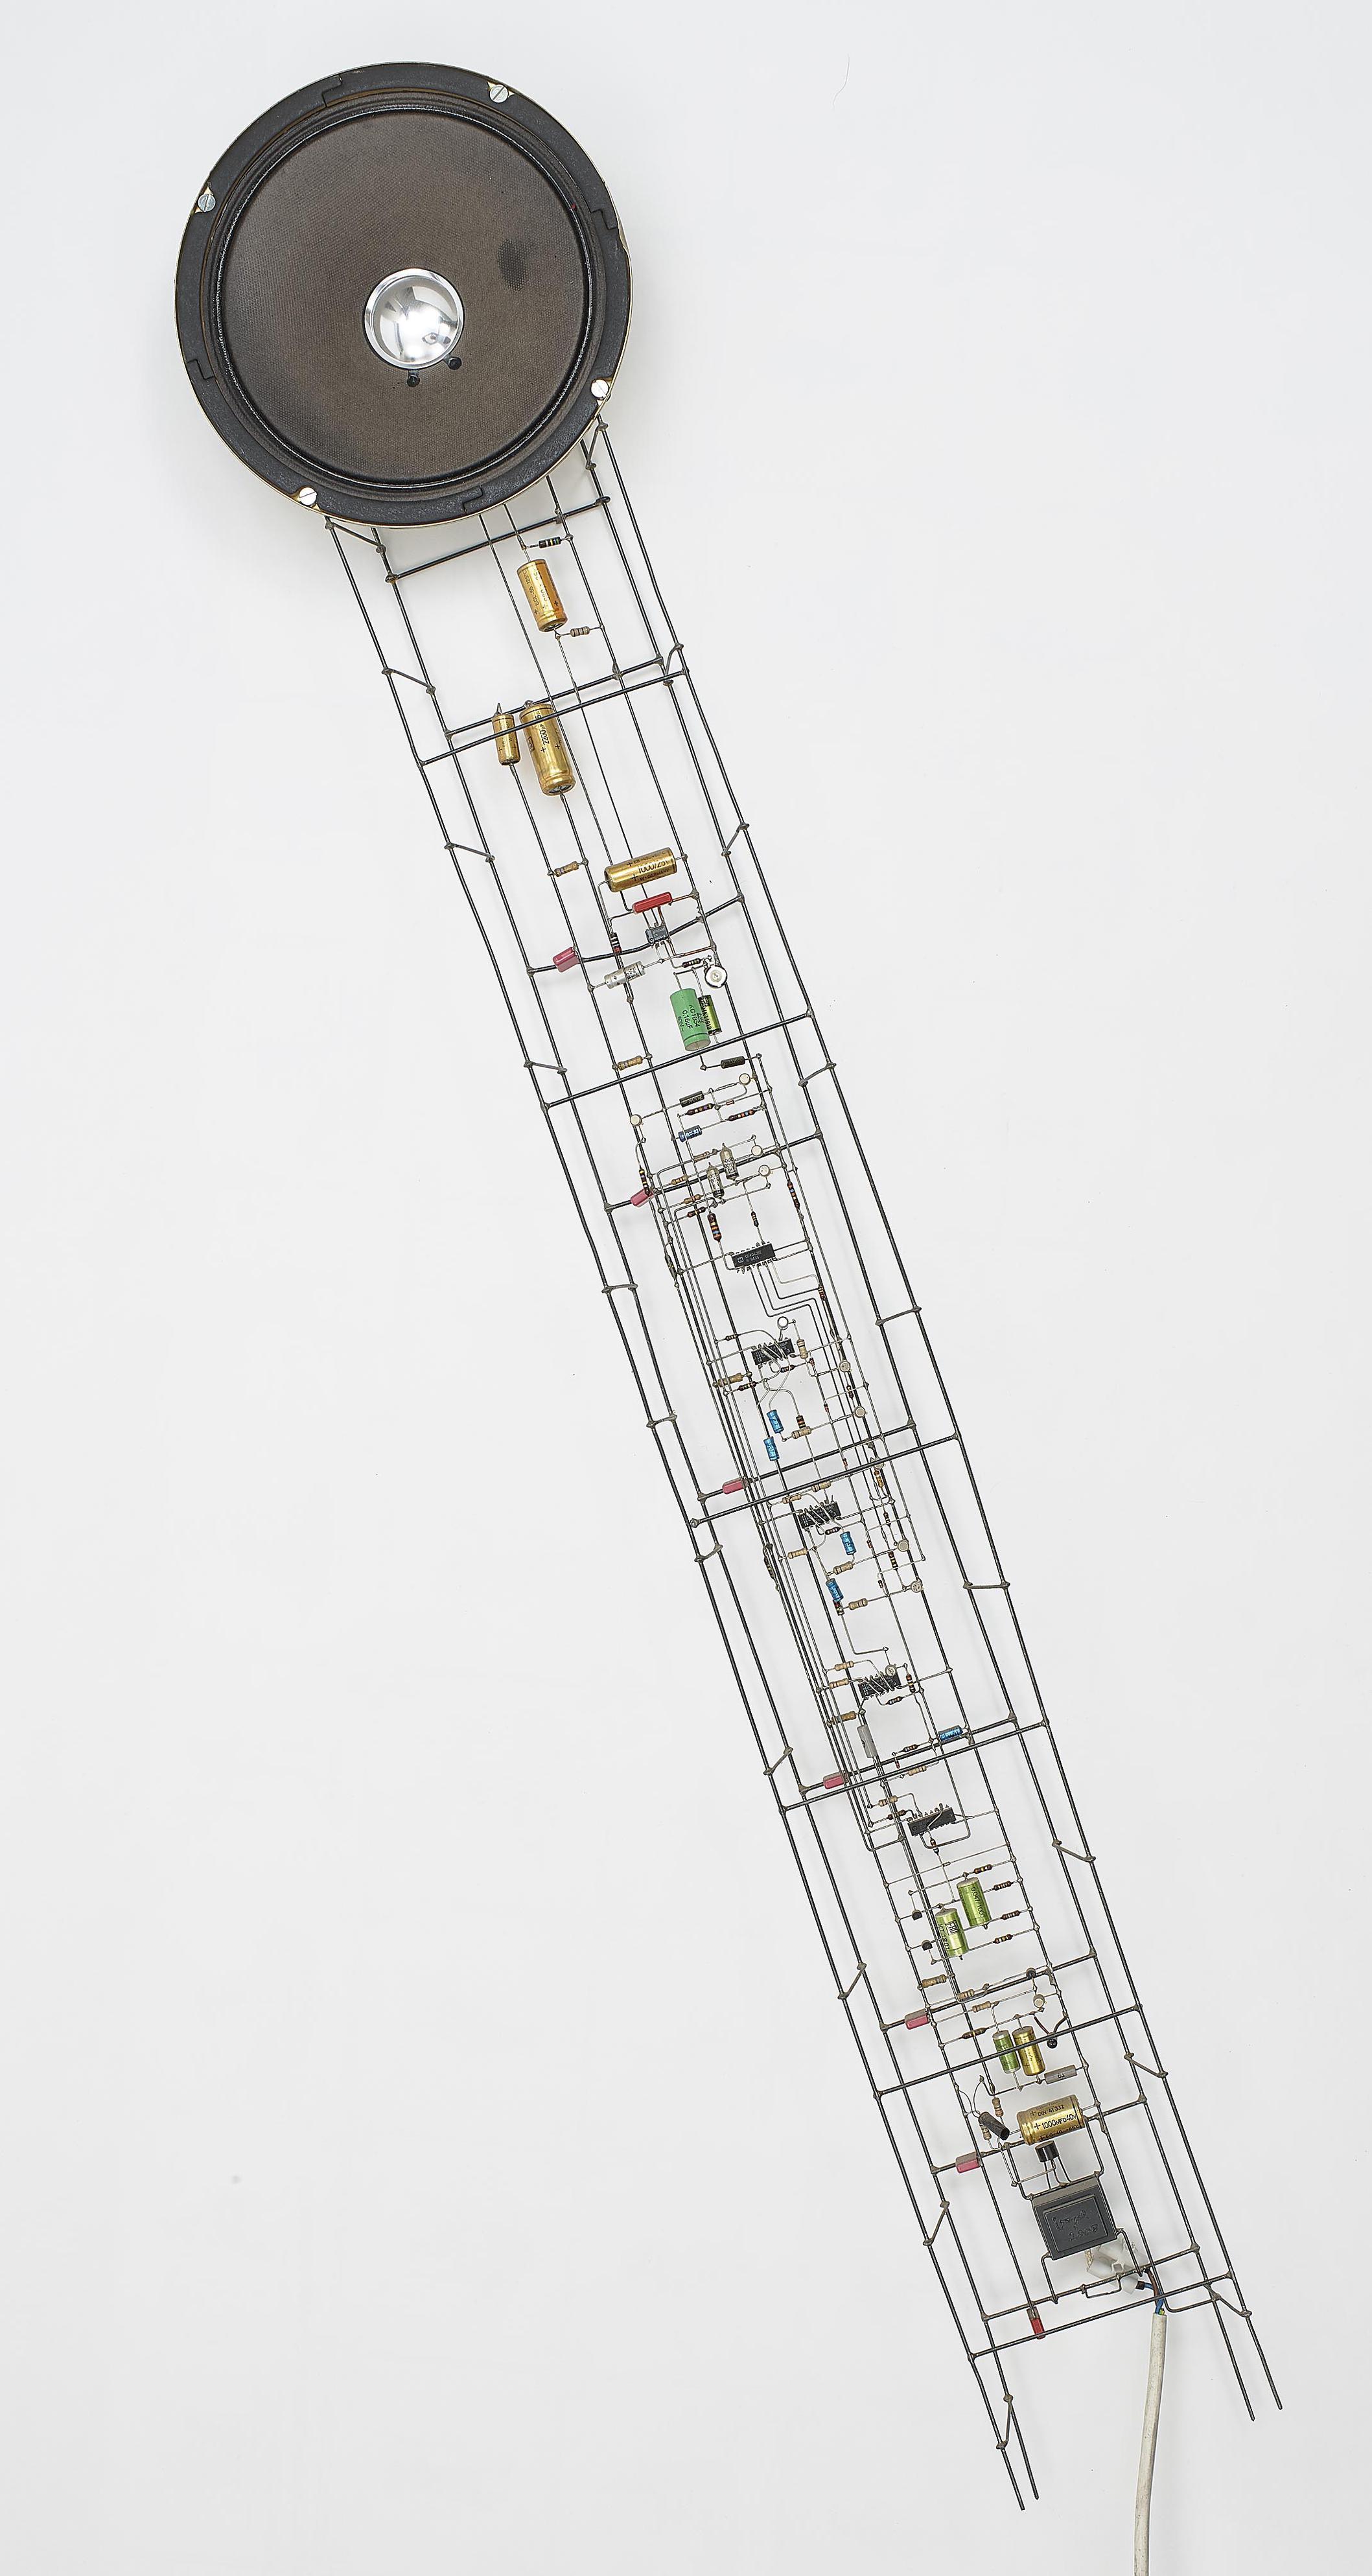 Peter Vogel - Klangobjekt (Sound object)-2000